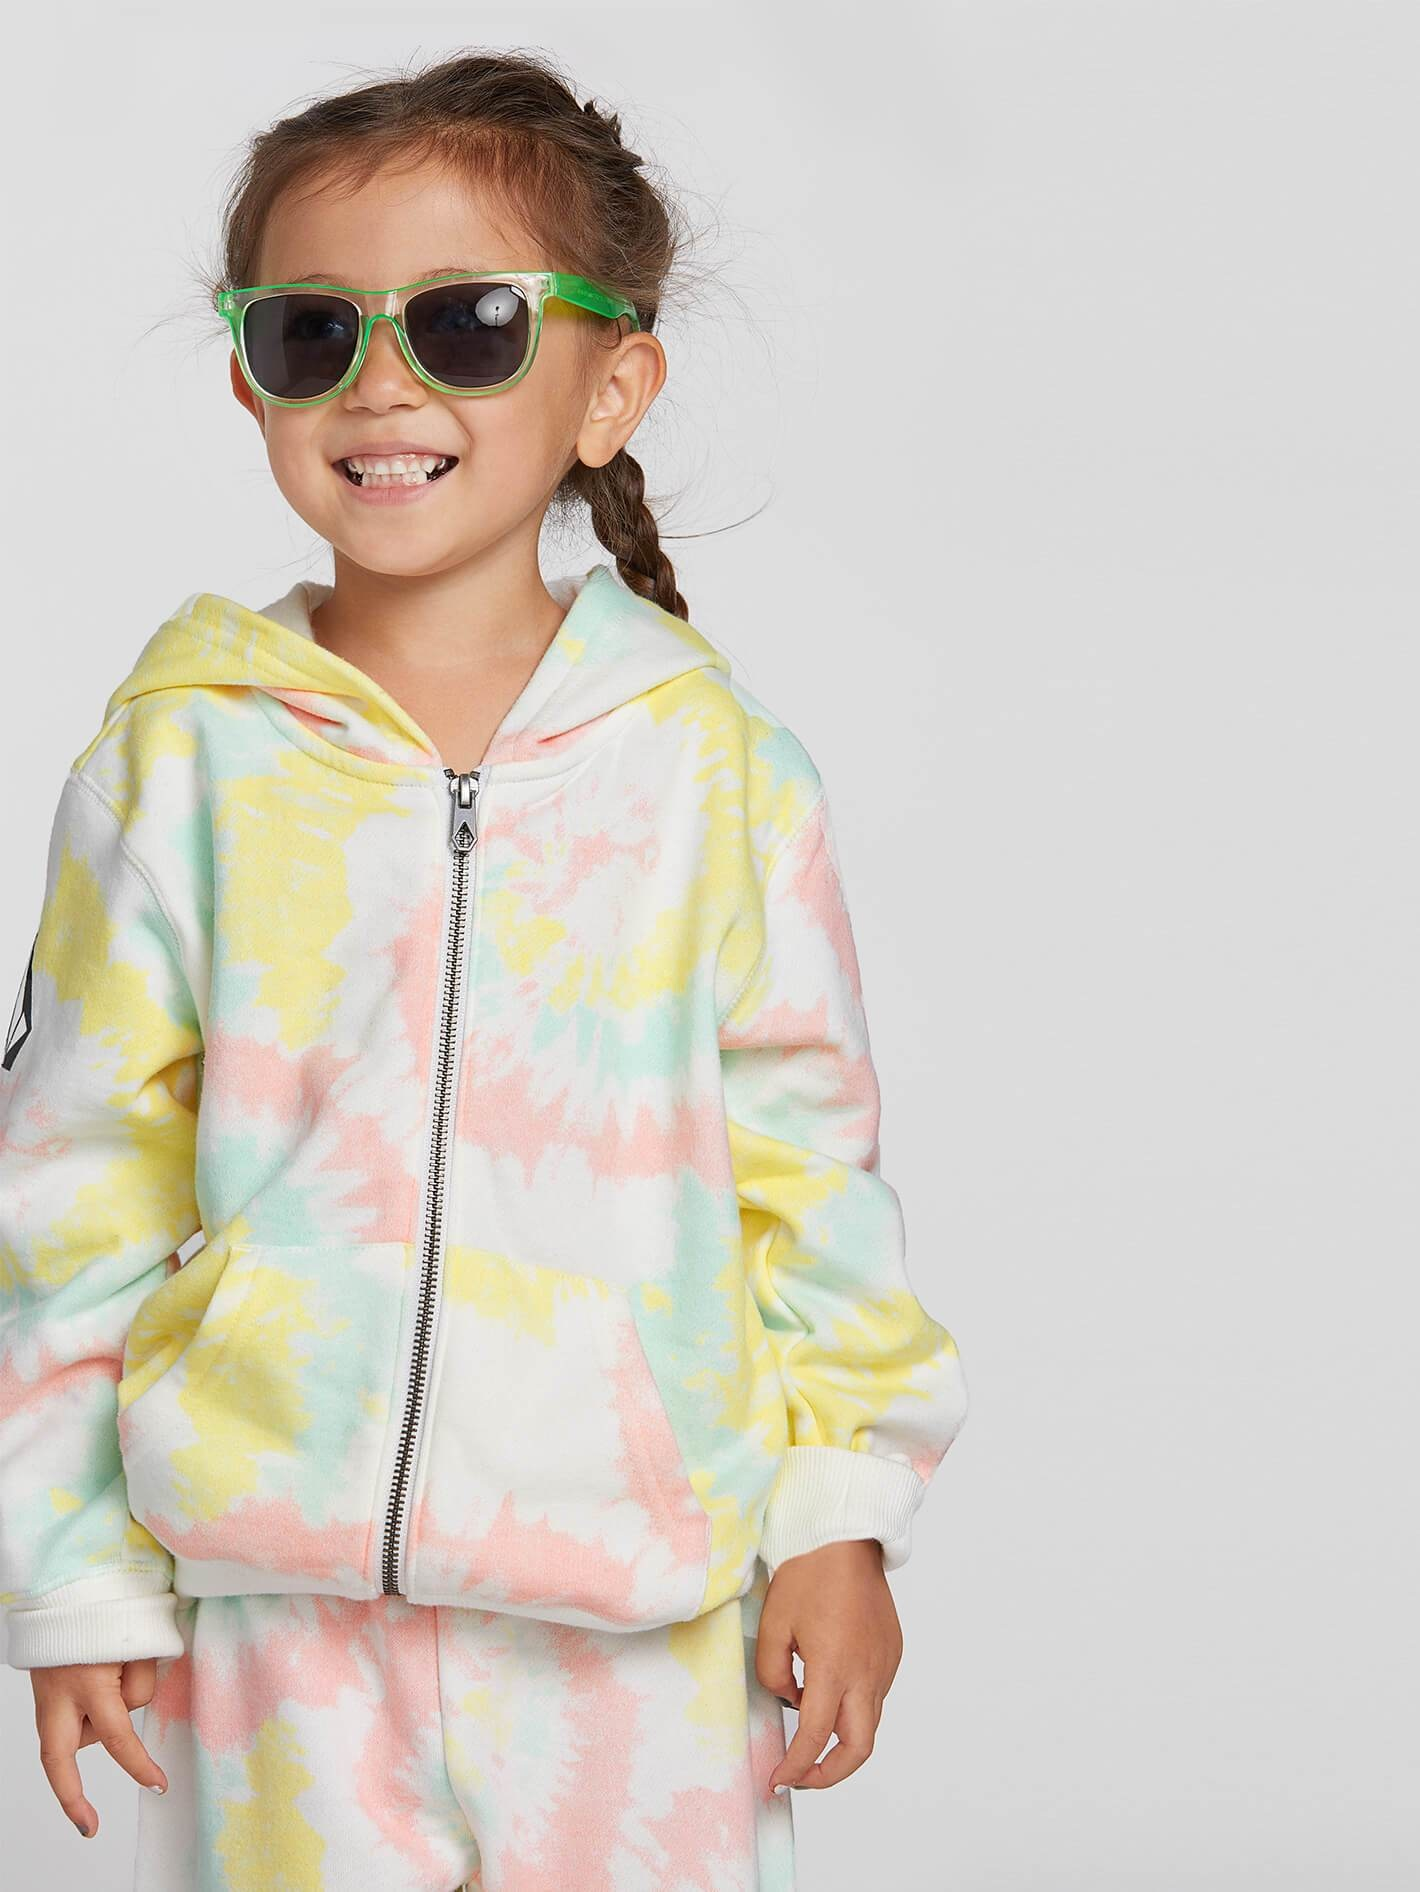 Volcom Little Girls Zippety Hooded Zip Up Sweatshirt